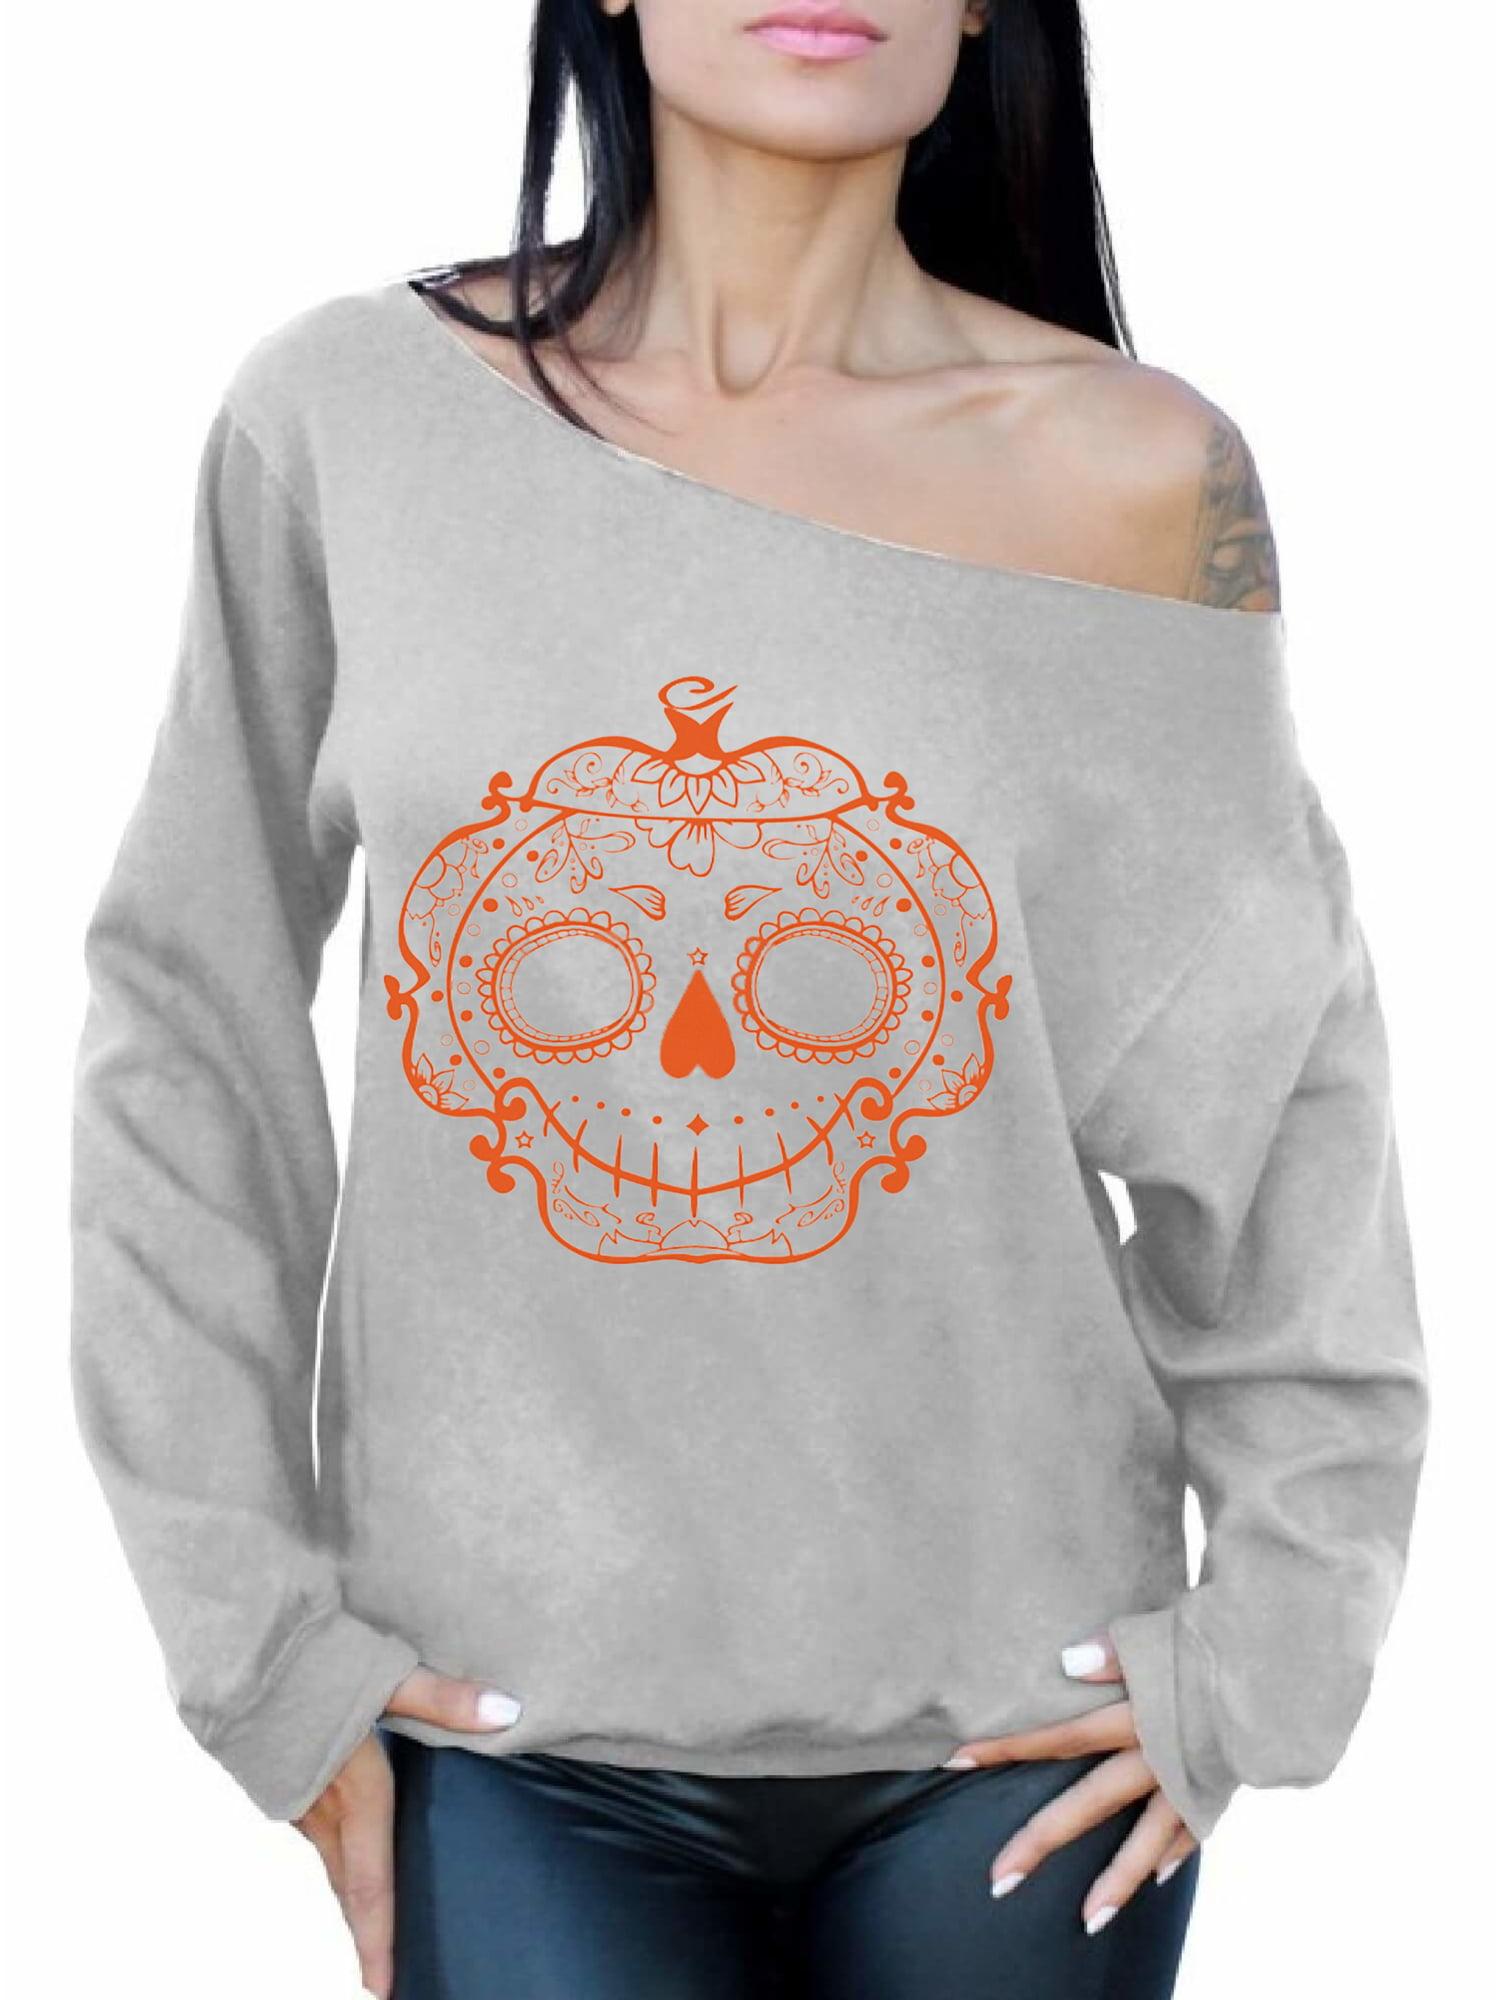 564b5875f63 Awkward Styles Halloween Sugar Pumpkin Off Shoulder Sweatshirt Sugar Skull  Oversized Sweatshirt Halloween Baggy Sweater for Women Spooky Gifts  Halloween ...